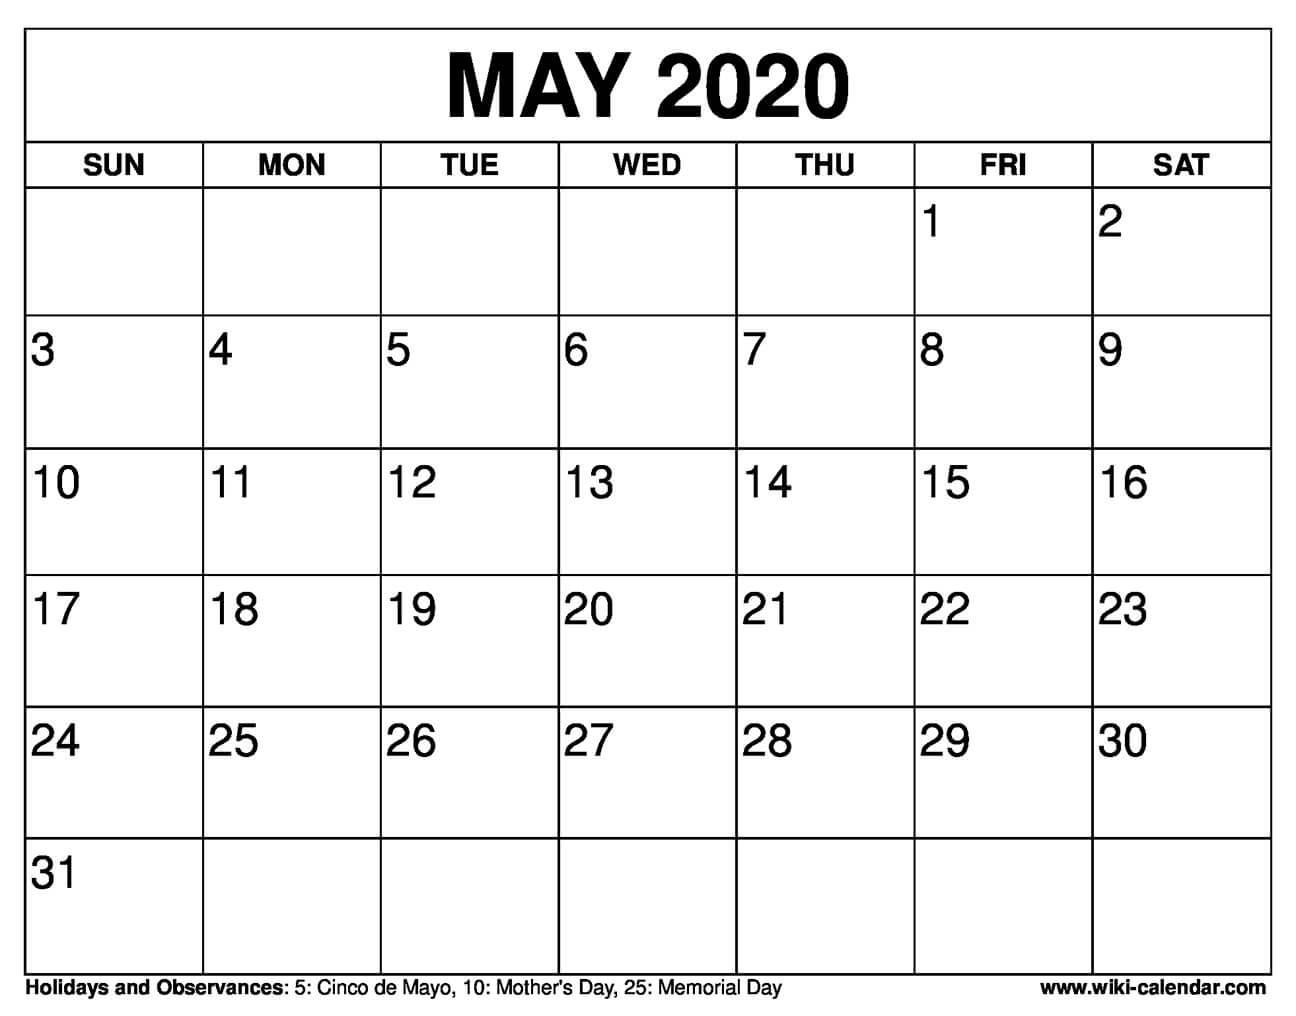 Free Printable May 2020 Calendars  May 2020 Calendar Printable